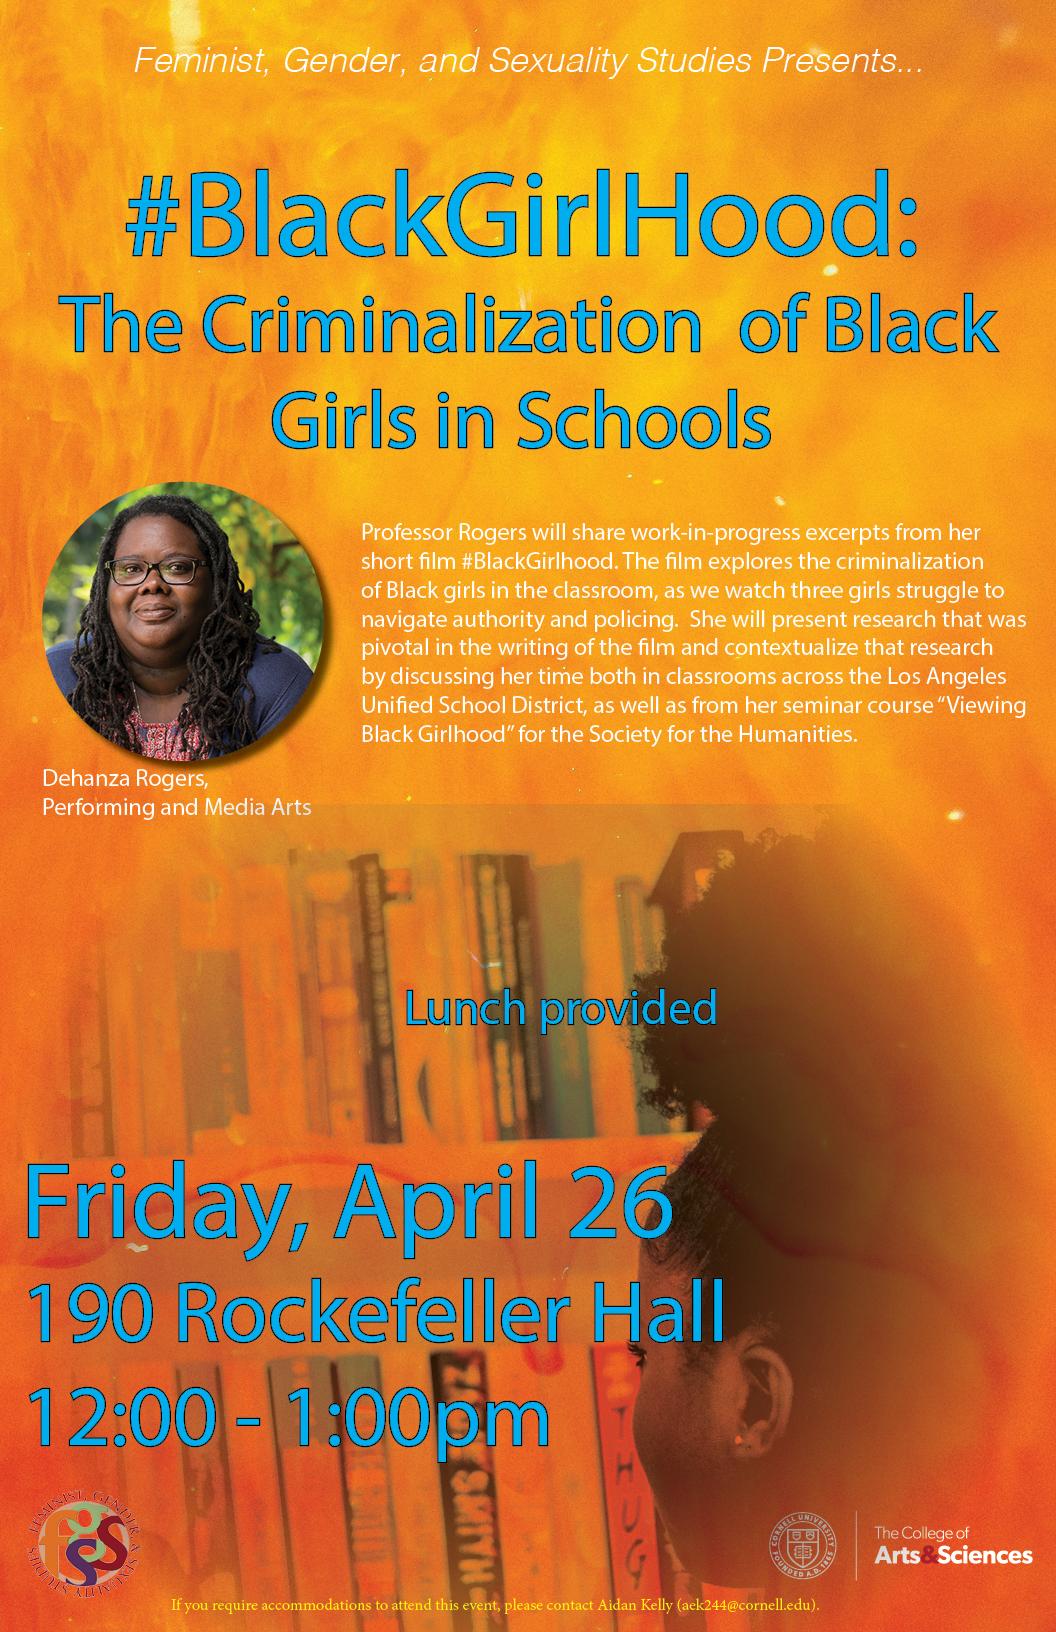 #BlackGirlhood: The Criminalization of Black Girls in Schools